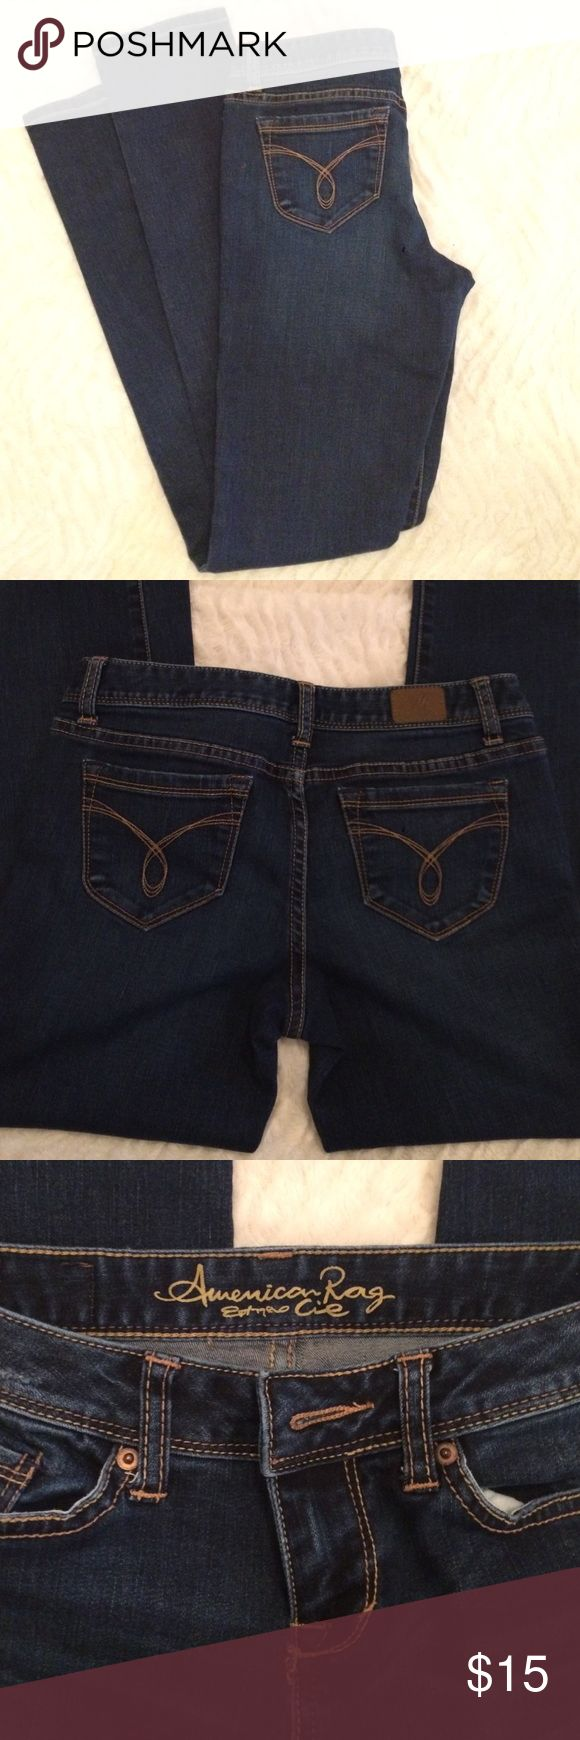 American Rag jeans. Size 3 Size 3 American Rag jeans, dark stretchy denim, skinny leg. American Rag Jeans Skinny